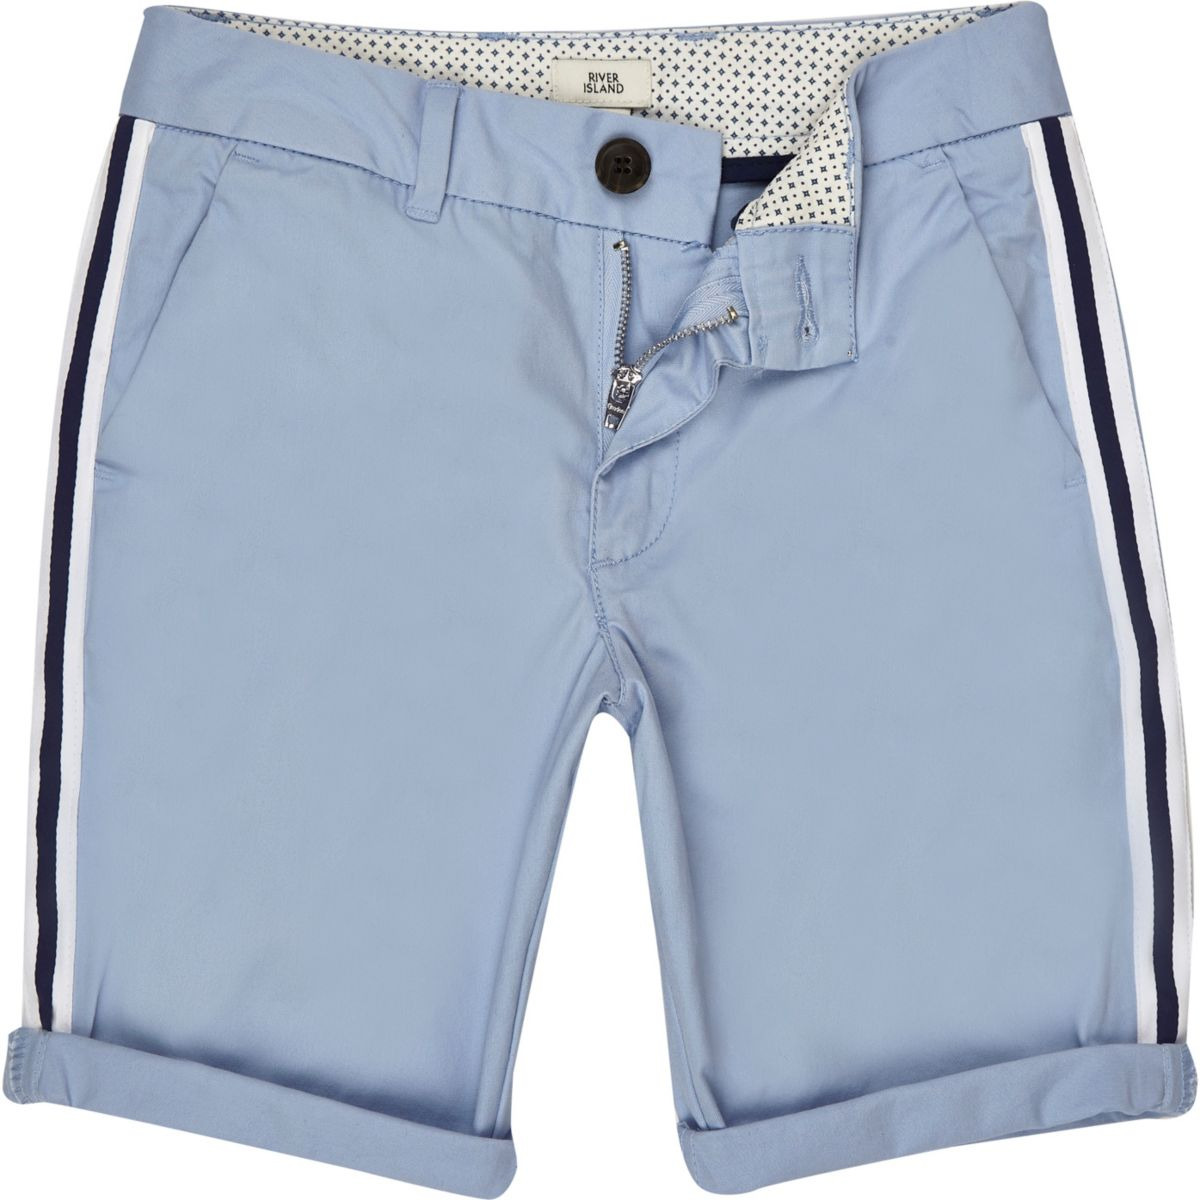 Boys blue tape chino shorts